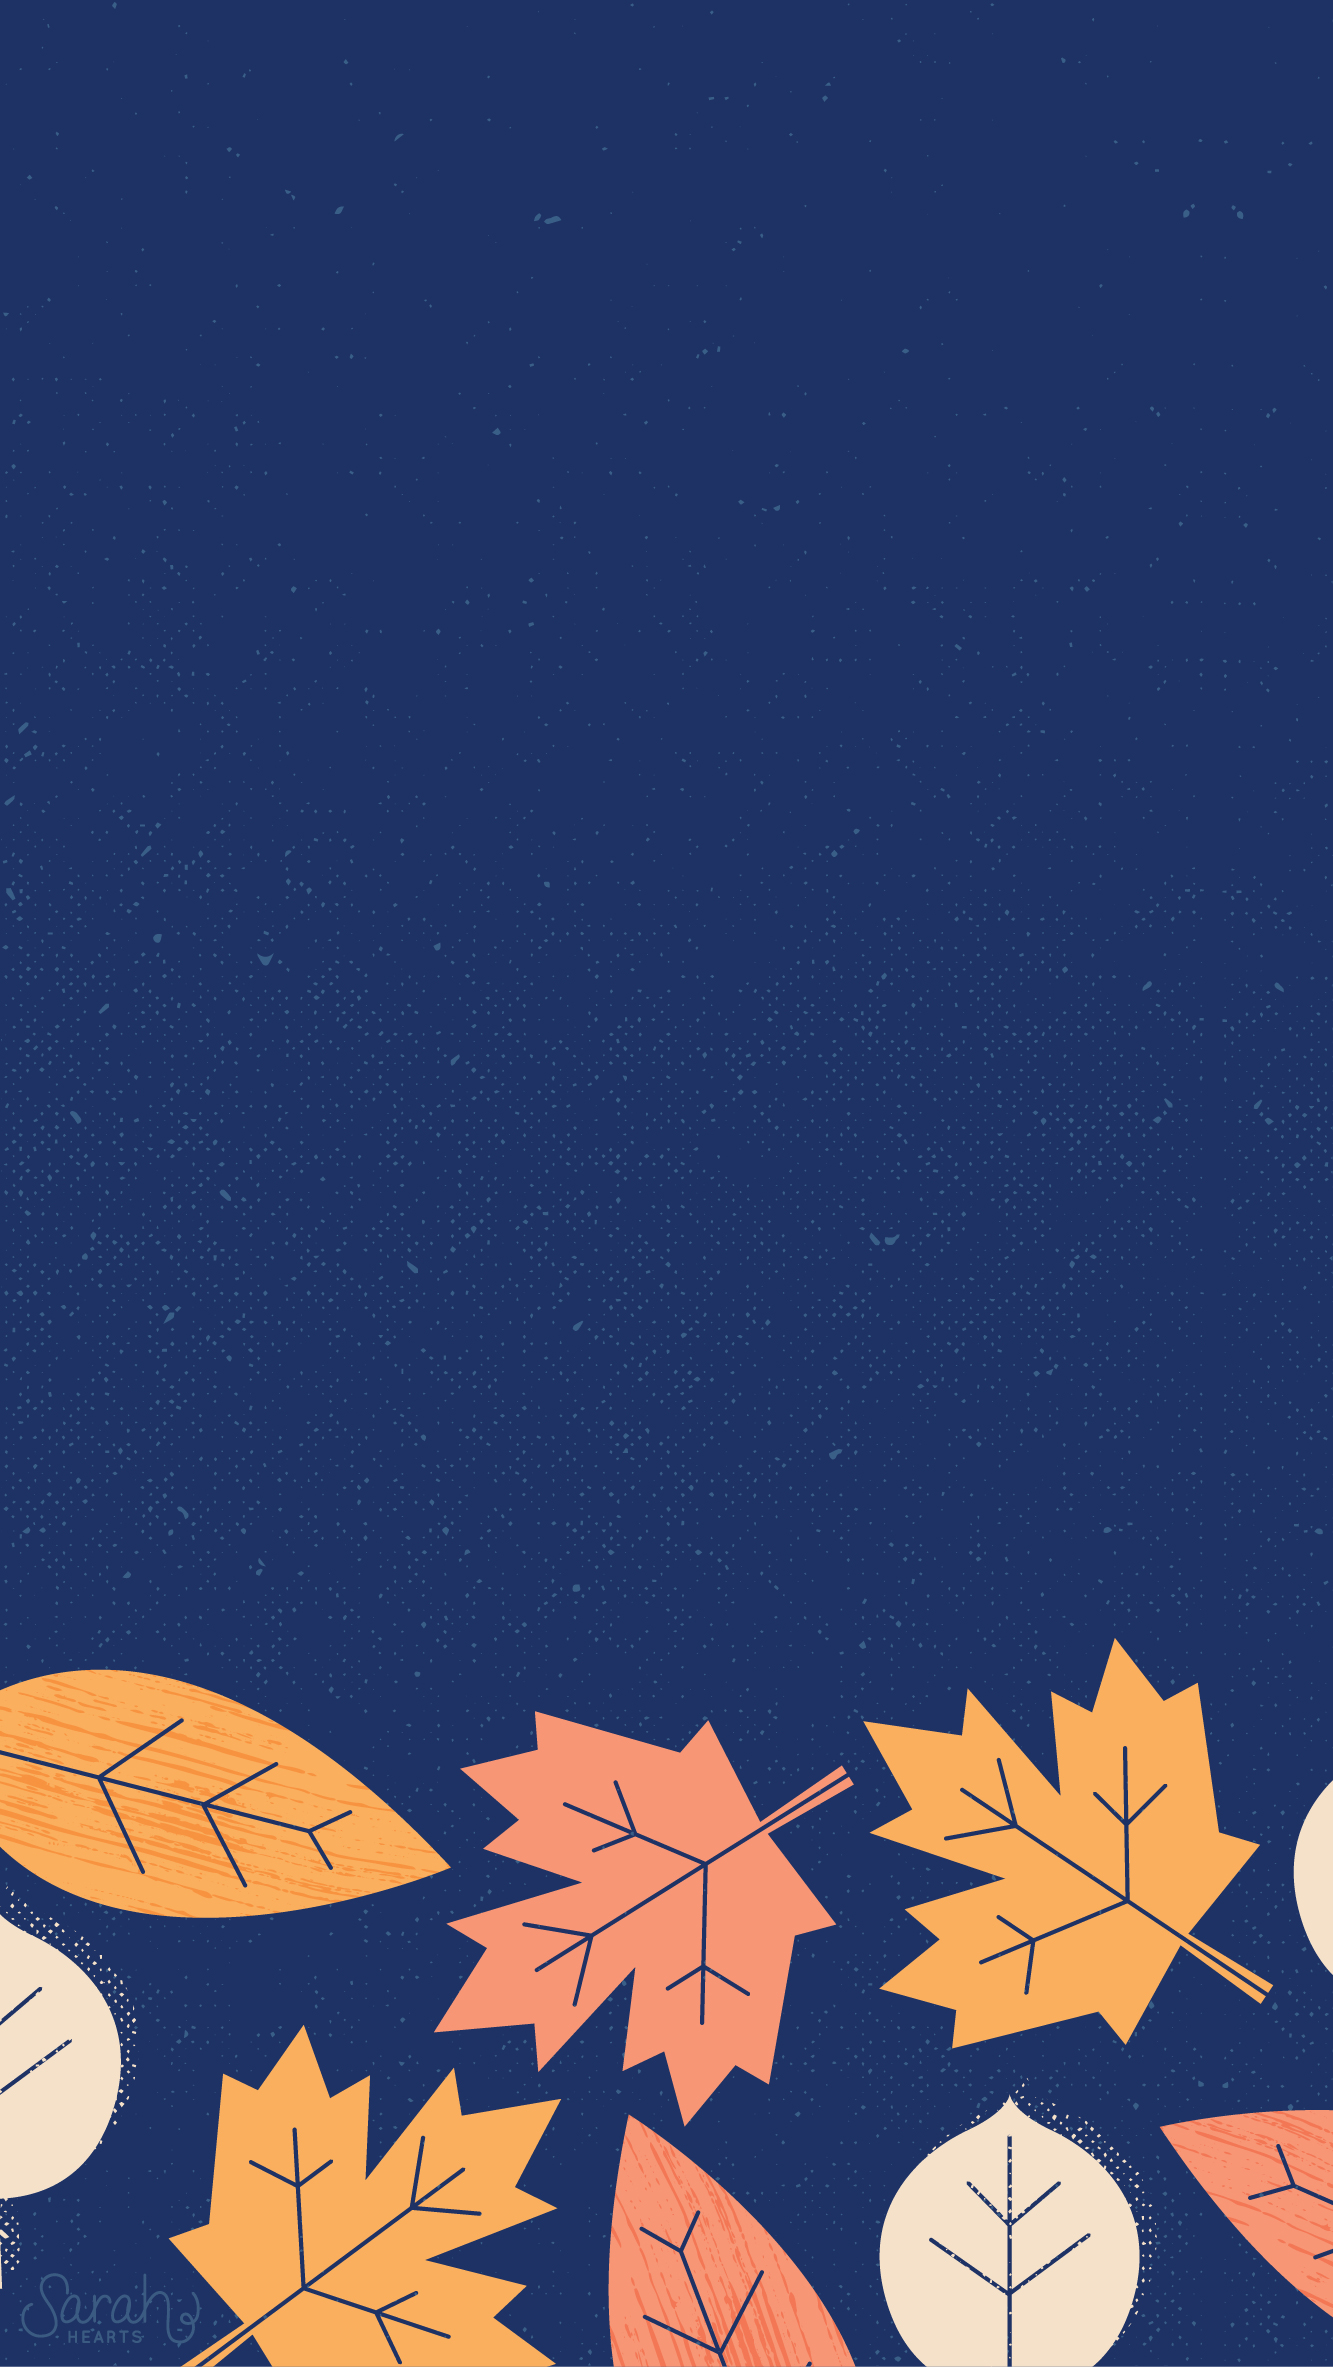 Nove Ber Fall Wallpaper For Computer November 2014 Calendar Wallpapers Sarah Hearts